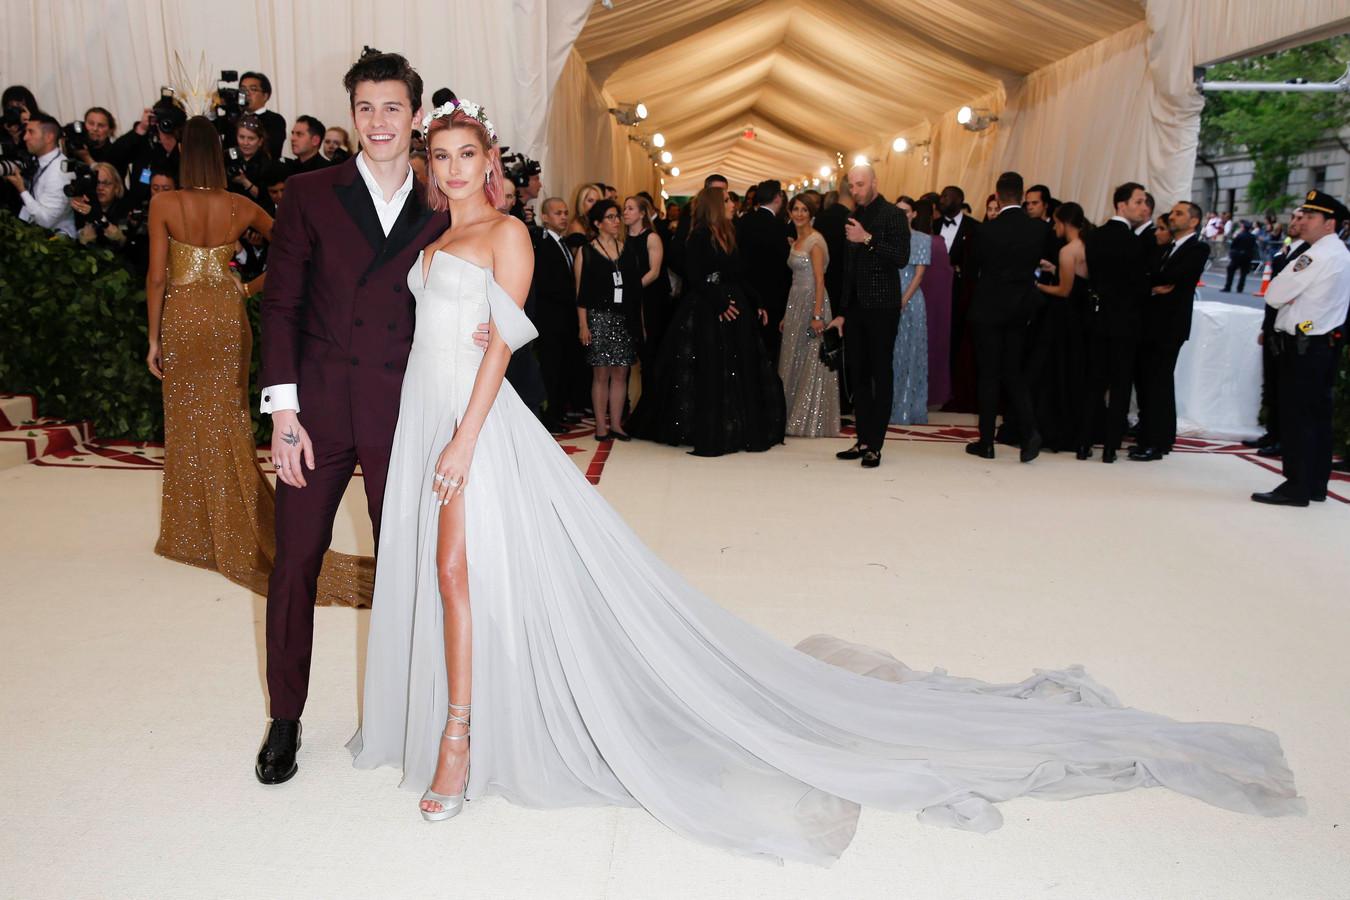 Shawn en Hailey komen toe op het MET Gala.